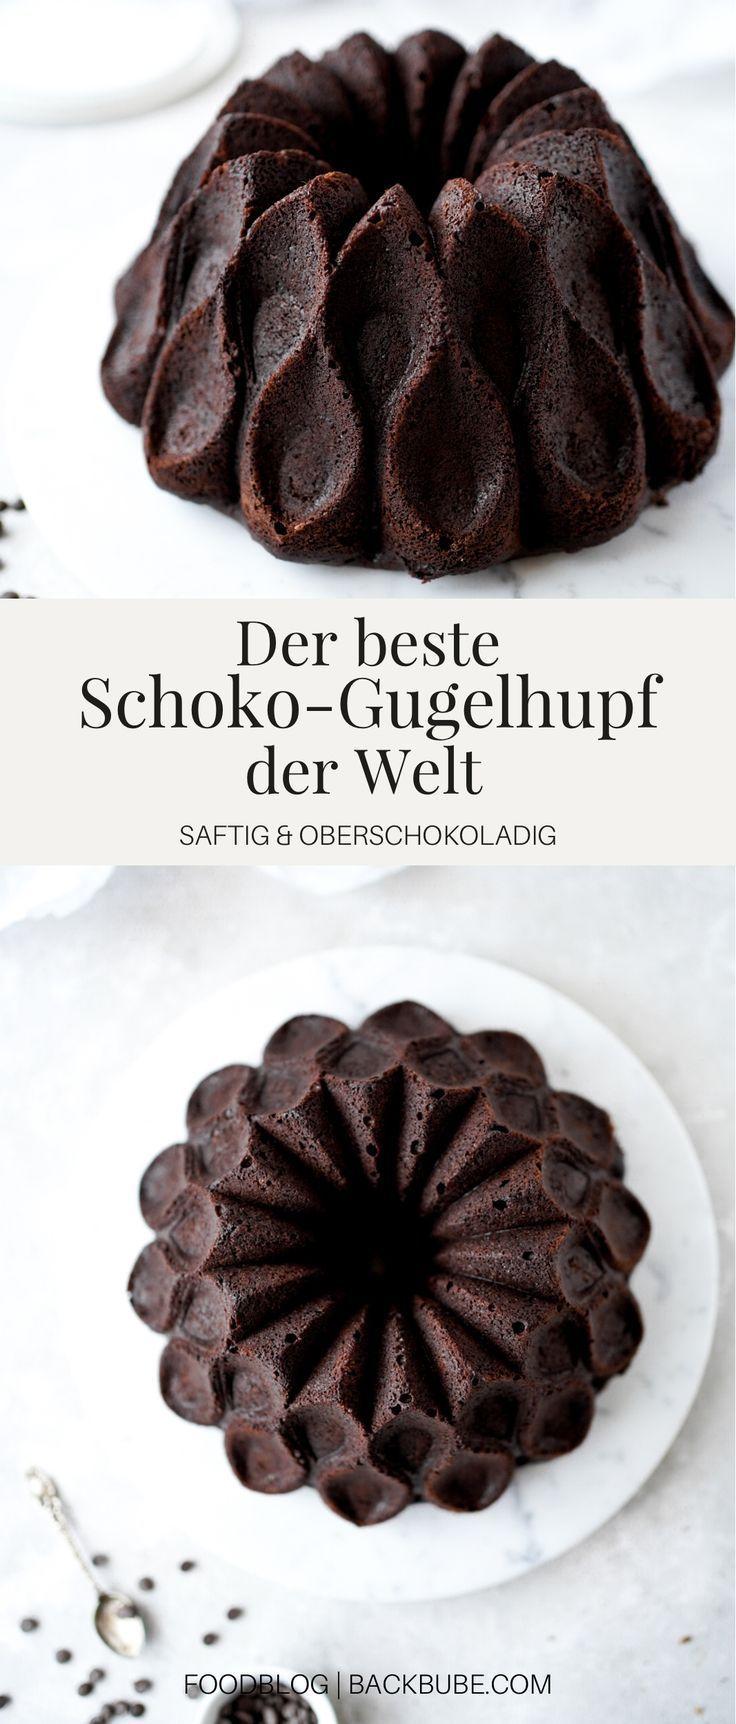 Photo of Der beste Schokoladen-Gugelhupf der Welt – schokoladig, saft…